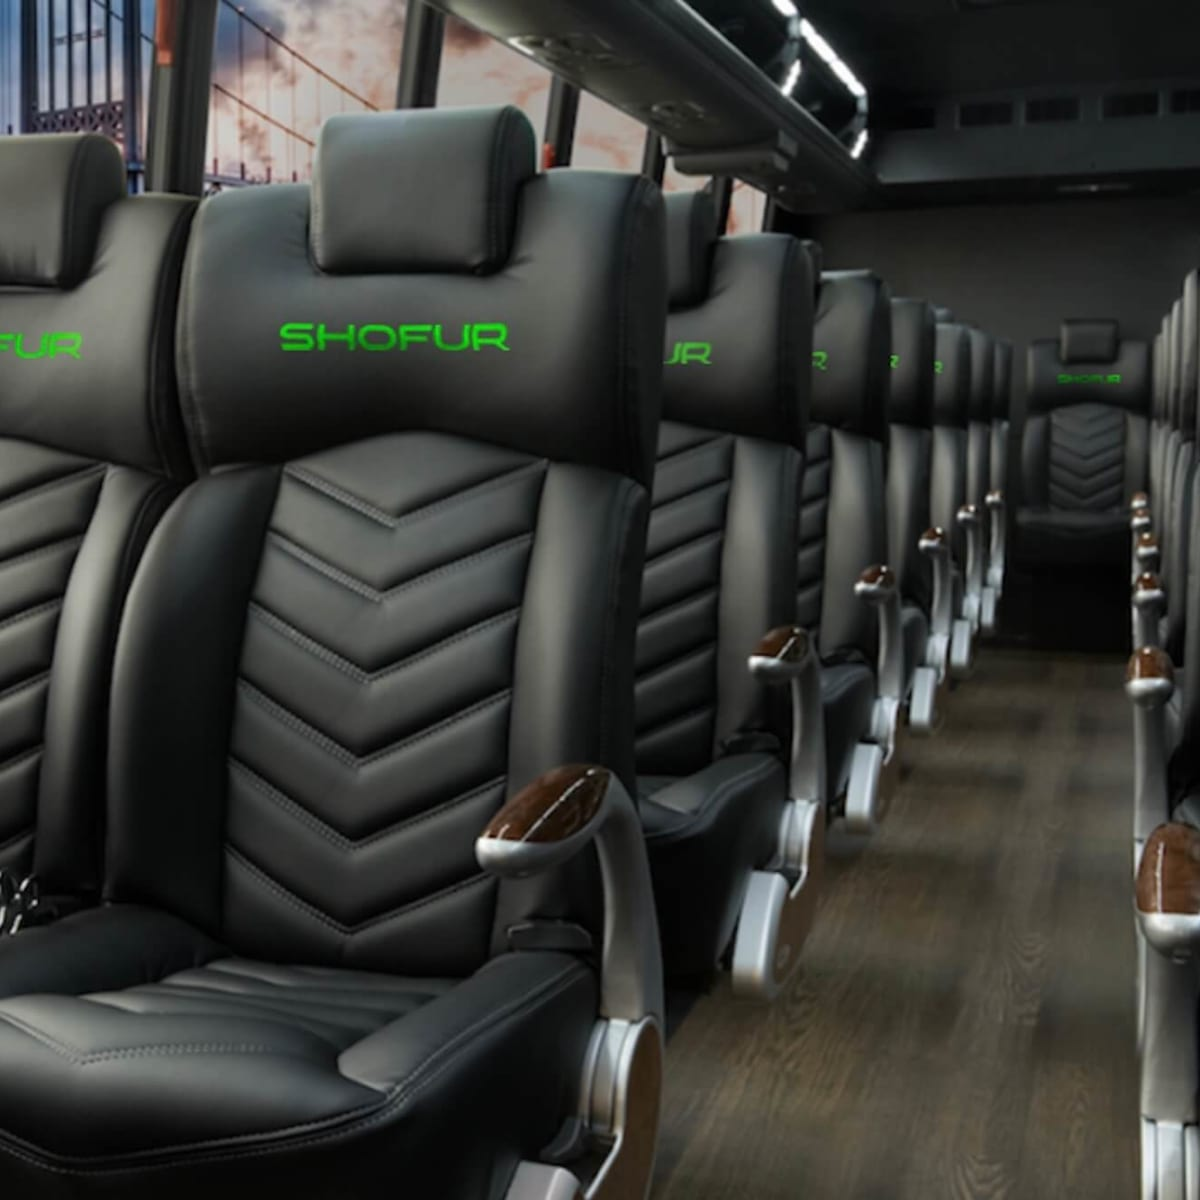 Shofur bus interior